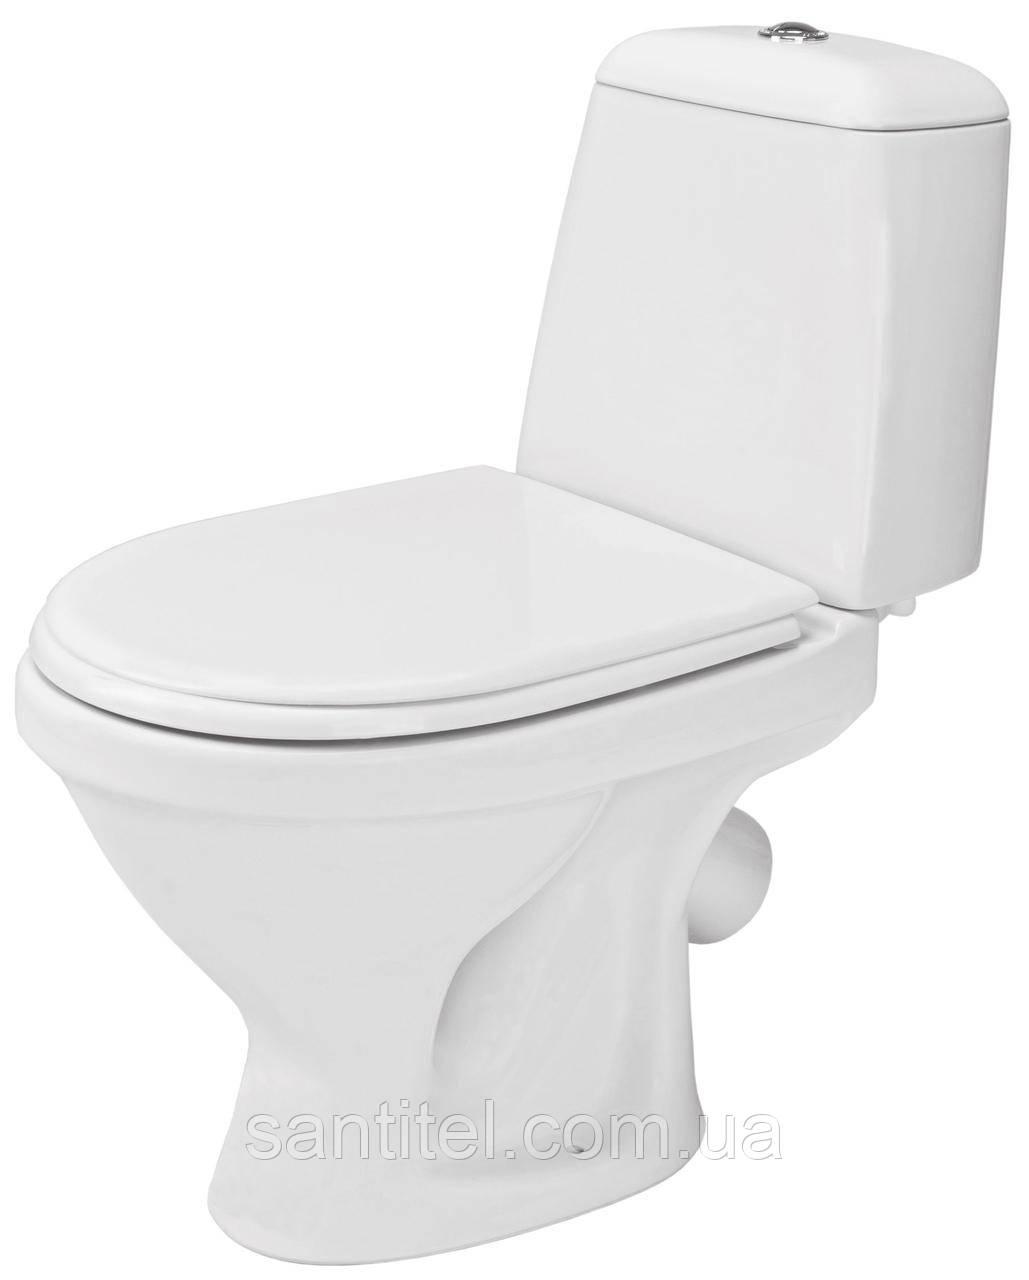 Компакт Cersanit 437 ЕKO Е031 3/6 с сиденьем дюропласт